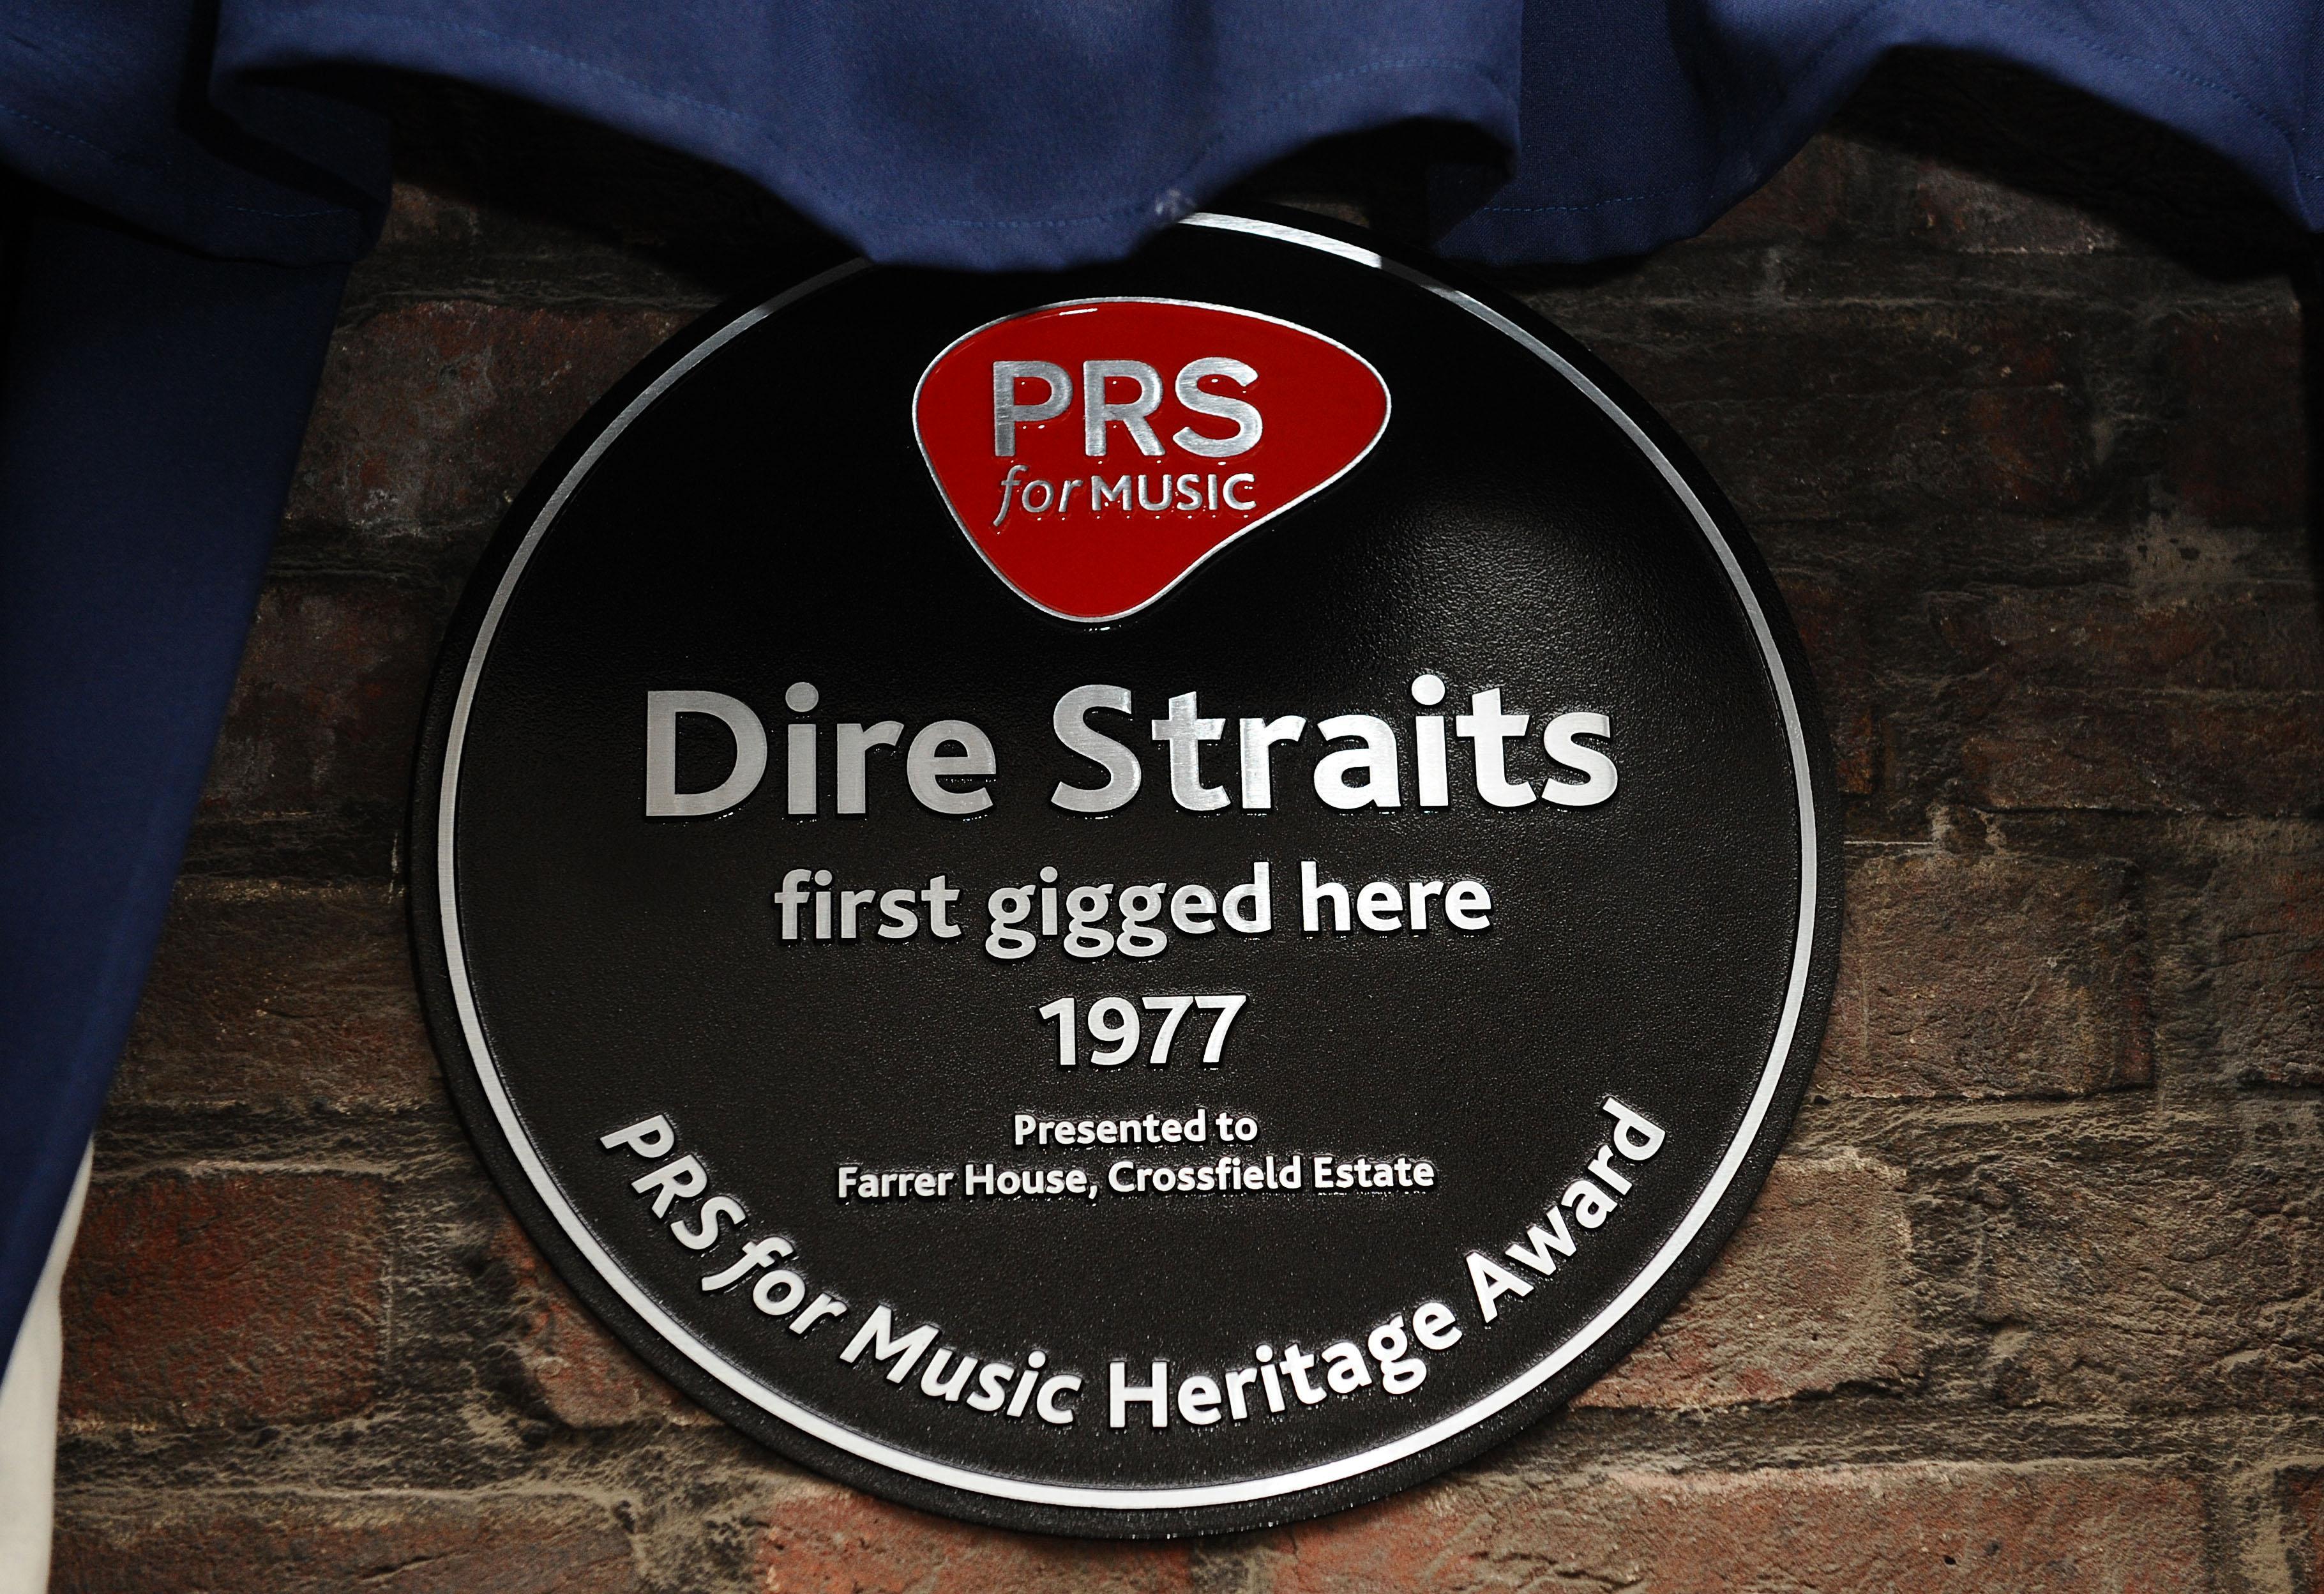 Dire Straits honoured